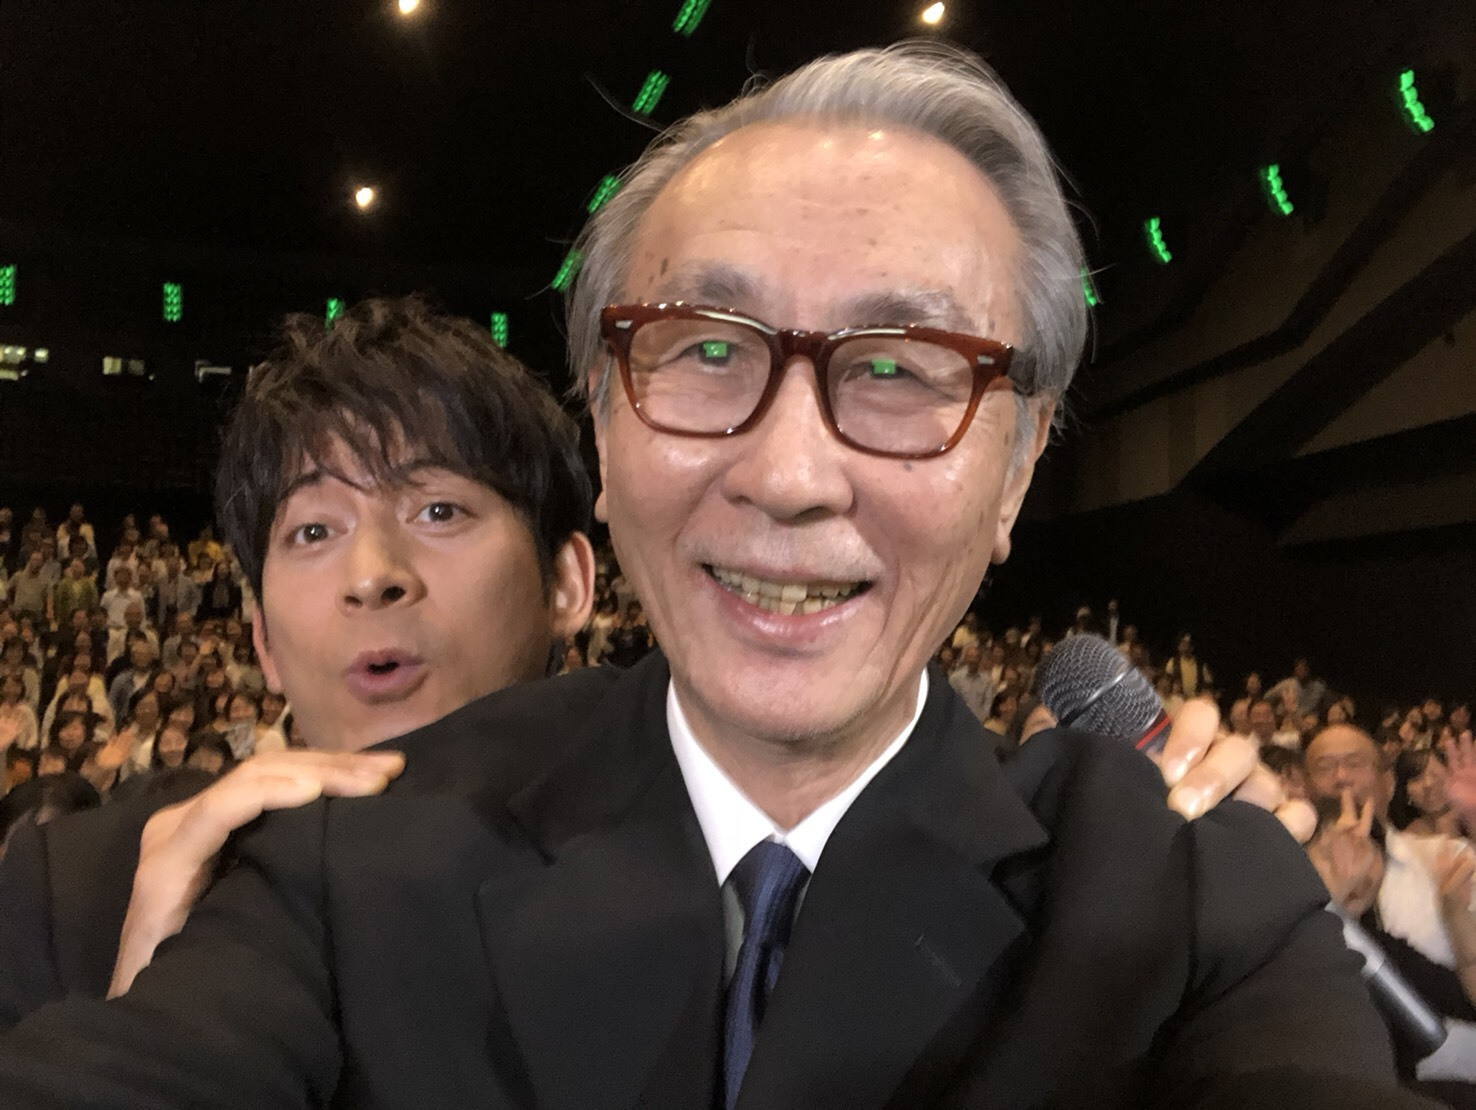 (C)2018「散り椿」製作委員会